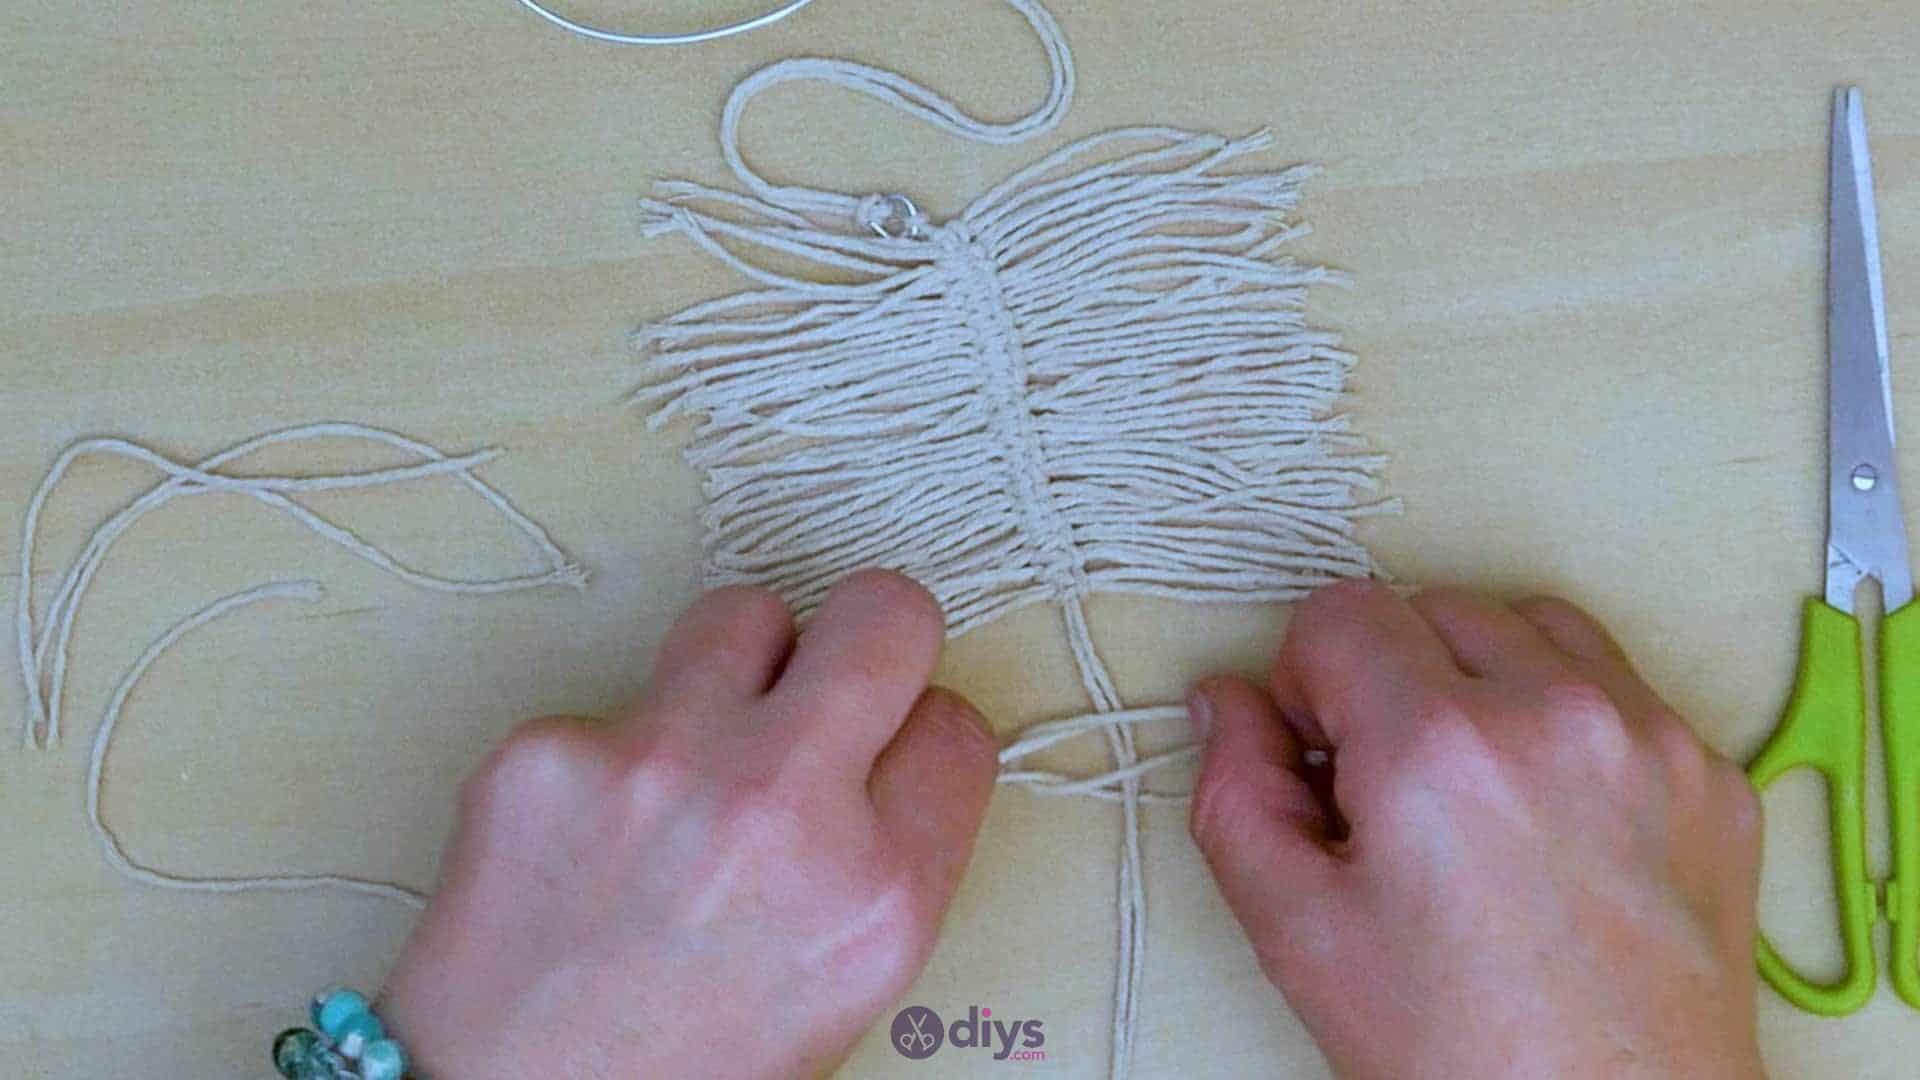 Diy hanging jute leaf step 7a